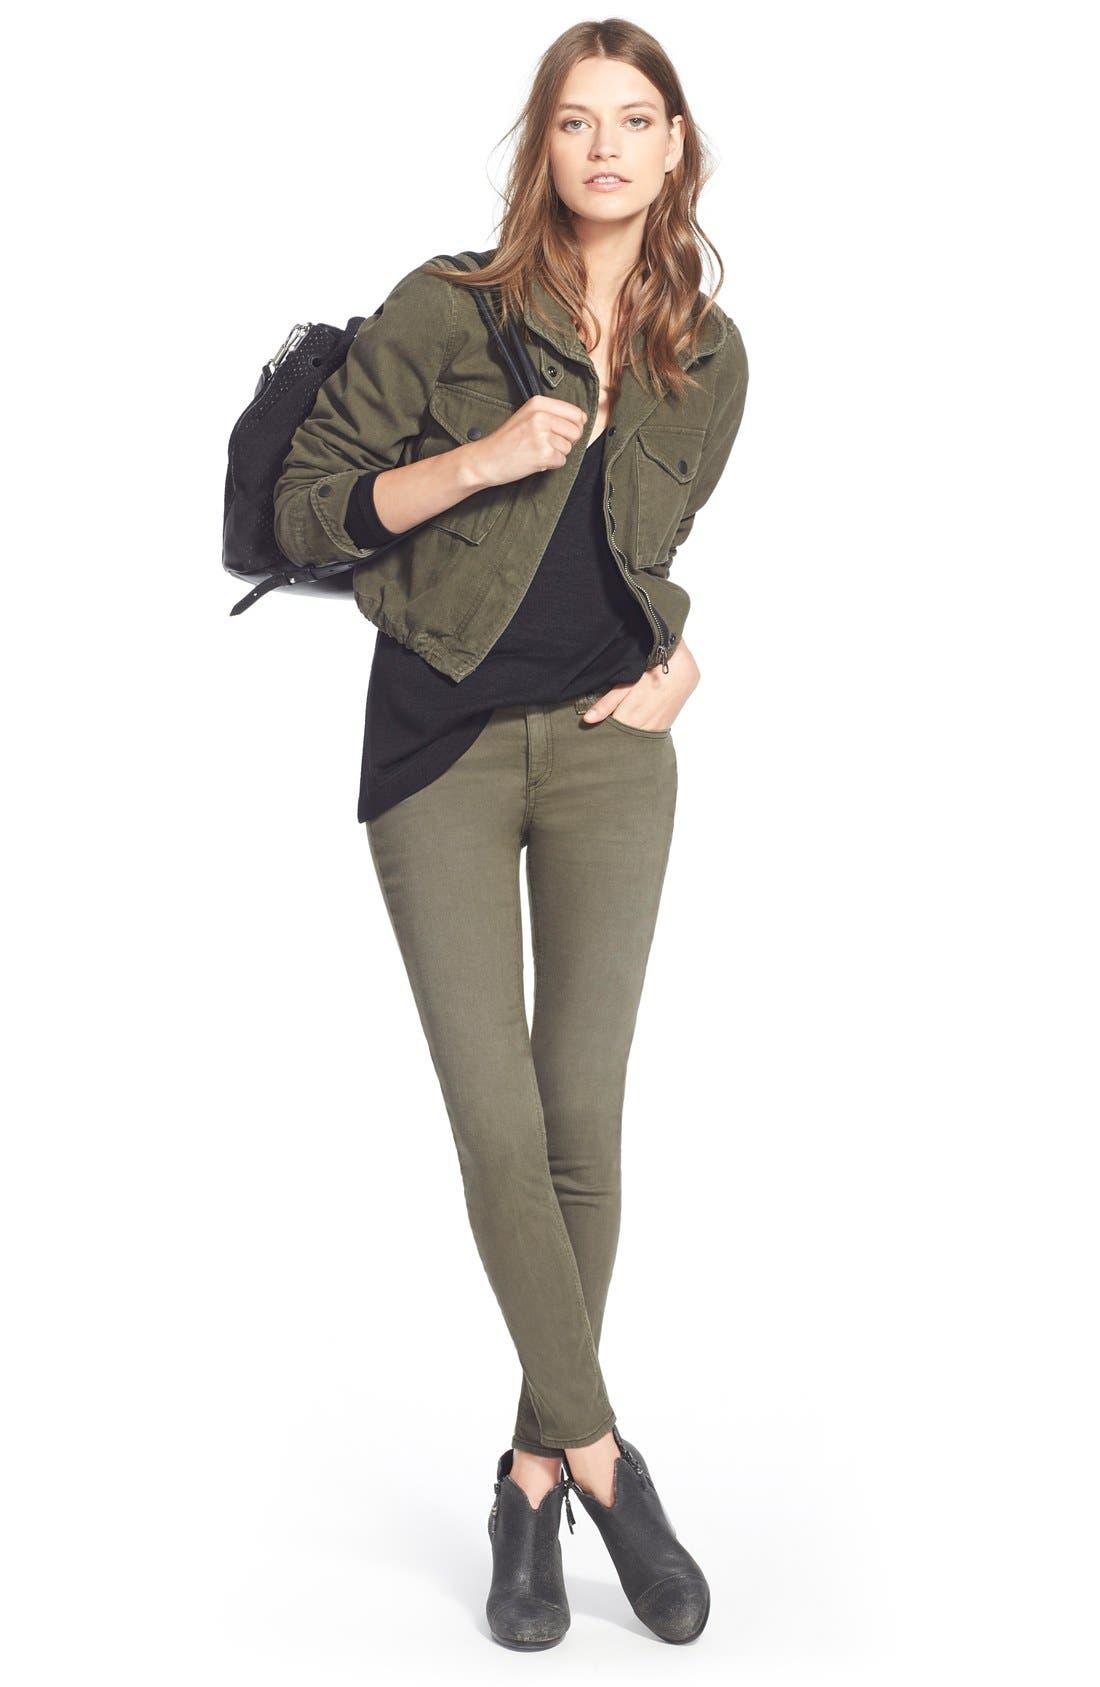 Alternate Image 4  - rag & bone/JEAN 'The Skinny' Jeans (Distressed Fatigue) (Nordstrom Exclusive)